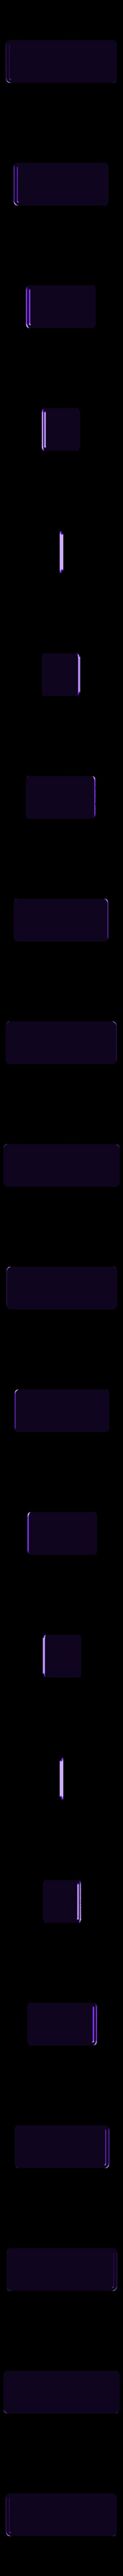 boomypi-window.stl Download free STL file Raspberry Pi Airplay BoomBox • 3D printer template, Adafruit